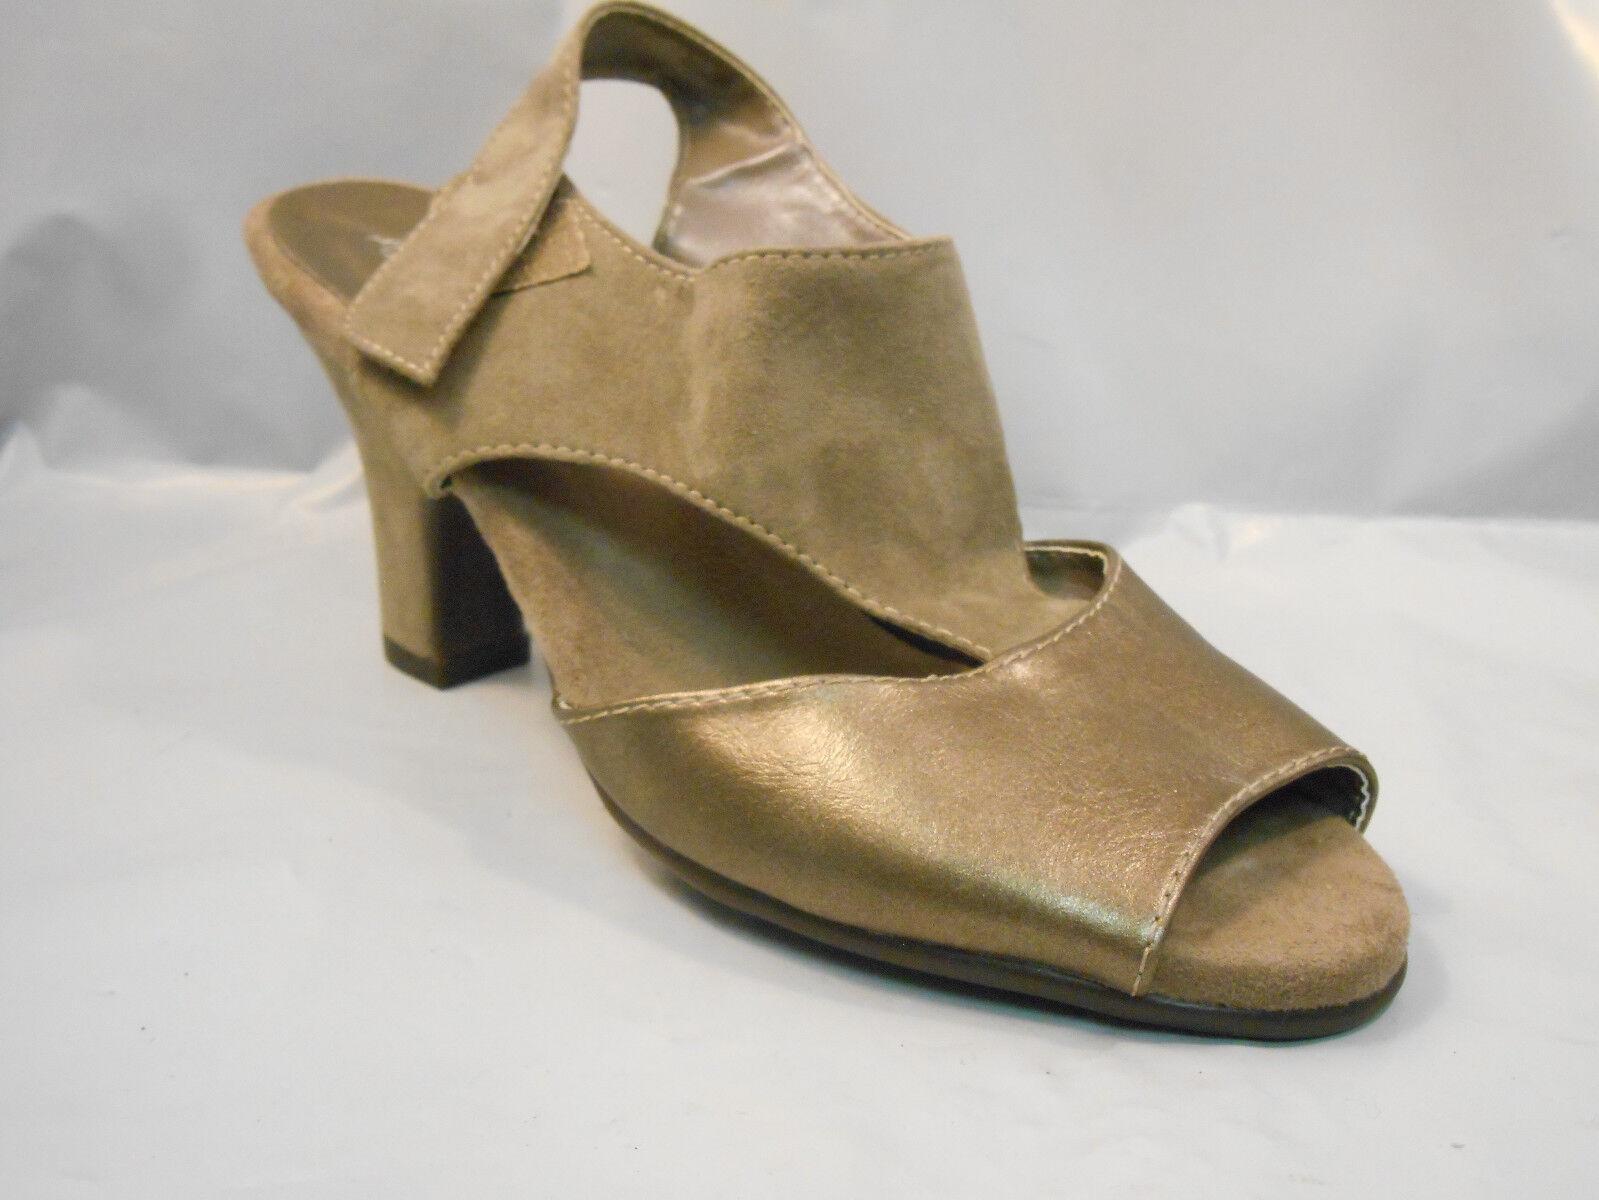 Aerosoles Taupe Brown Metallic Leather Peep Toe Heel Sandals Ankle Ankle Sandals Strap Sz 7 M 618892